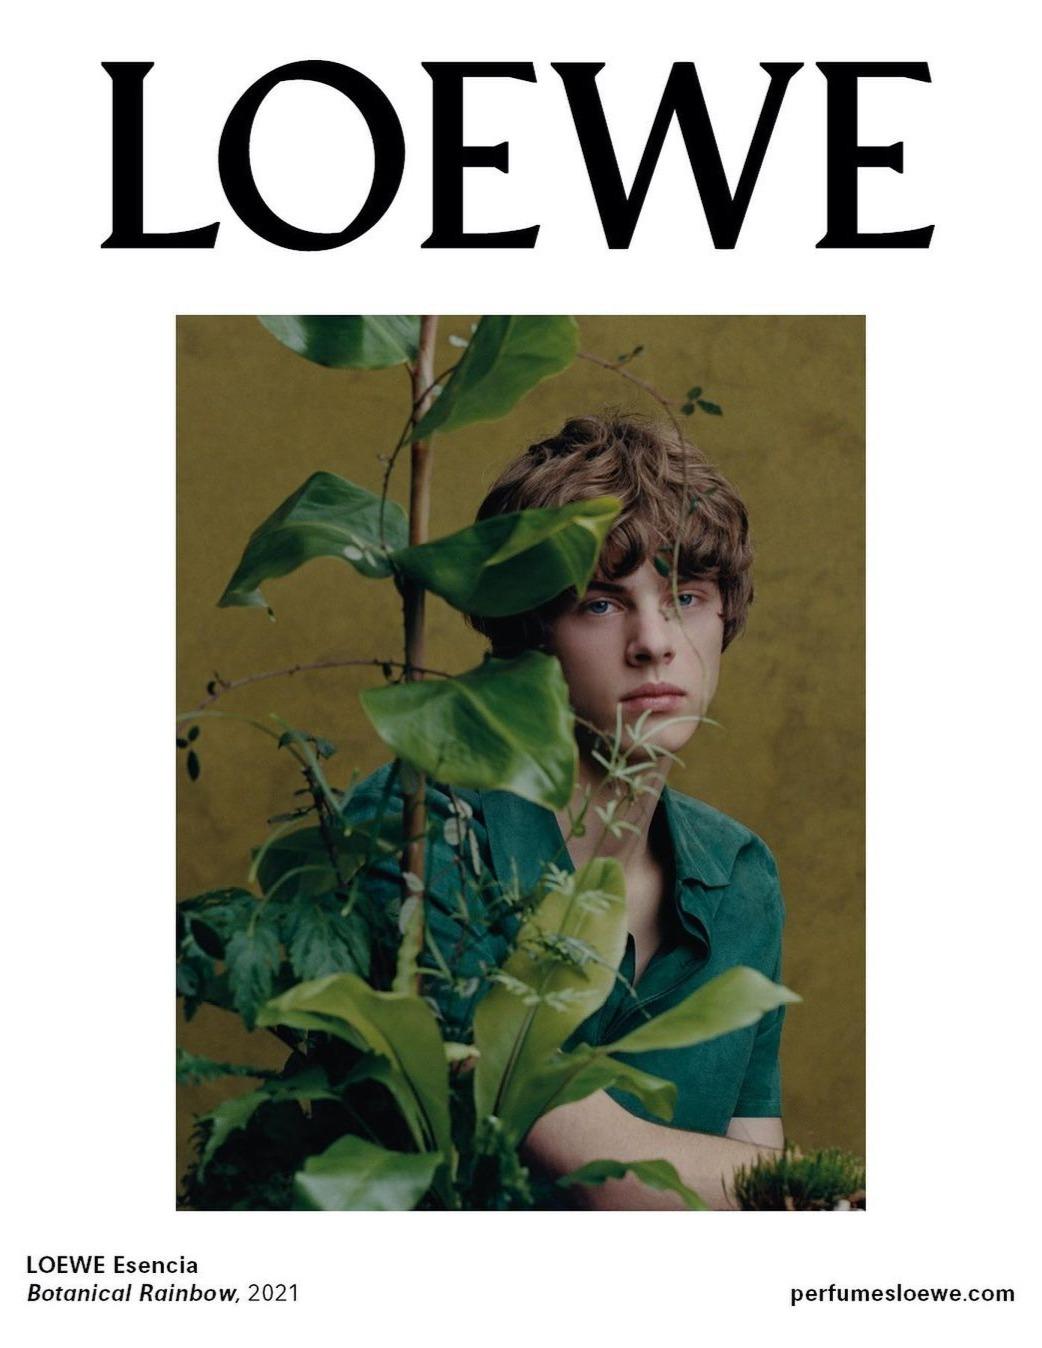 Loewe Perfumes - Botanical Rainbow Campaign